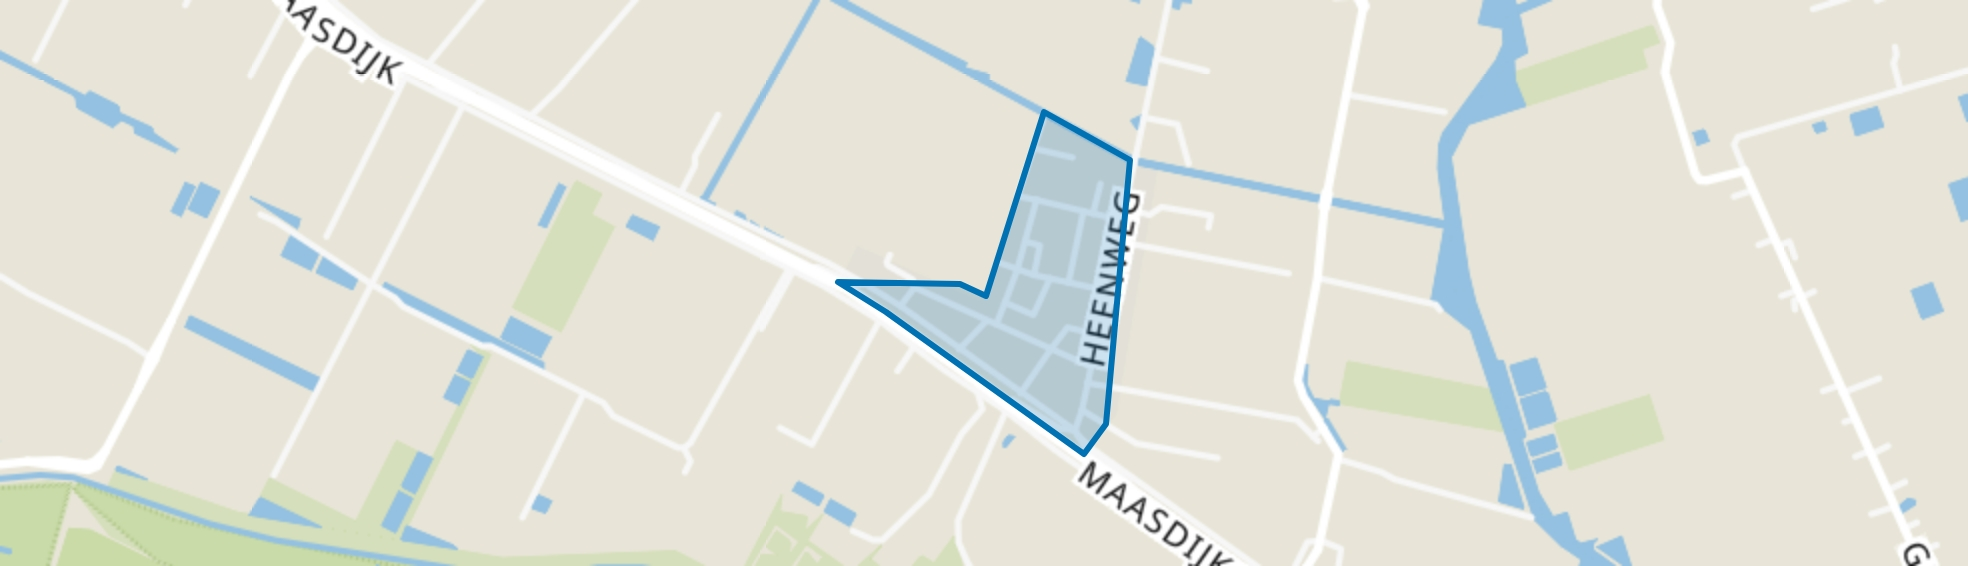 Heenweg, 's-Gravenzande map